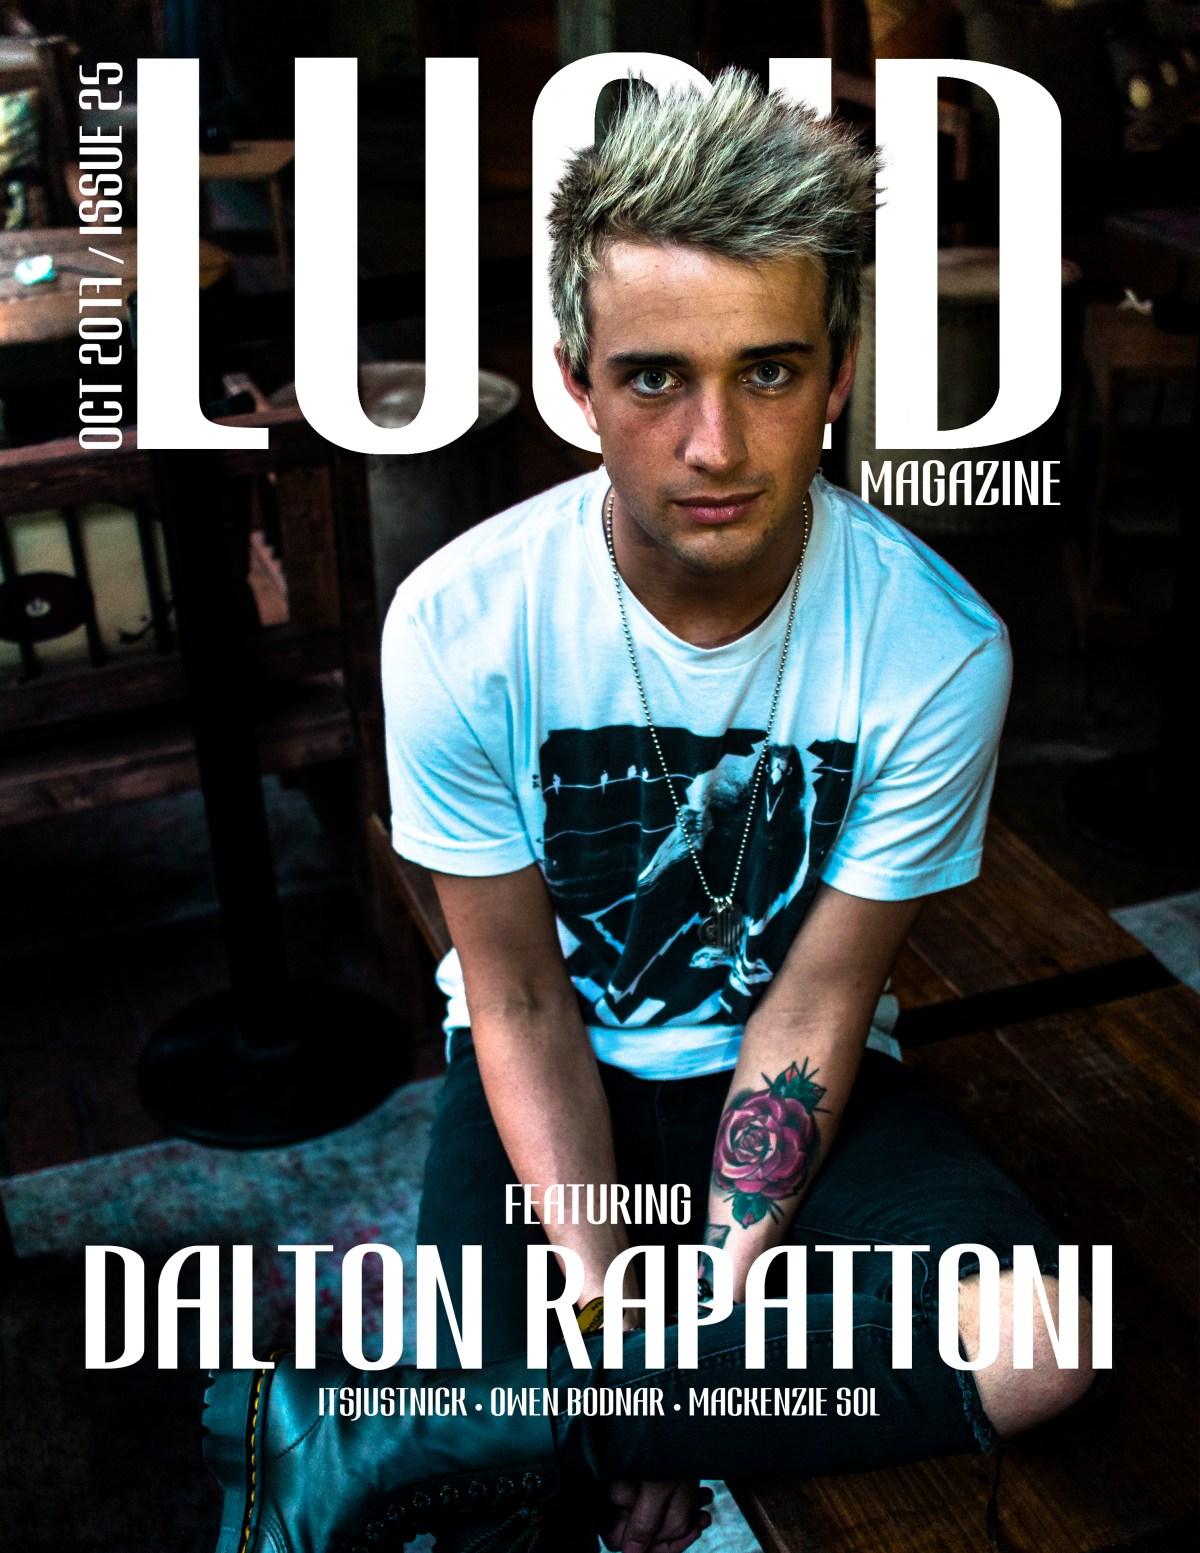 Lucid-Magazine-Jhanna-Shaghaghi-Dalton-Rapattoni